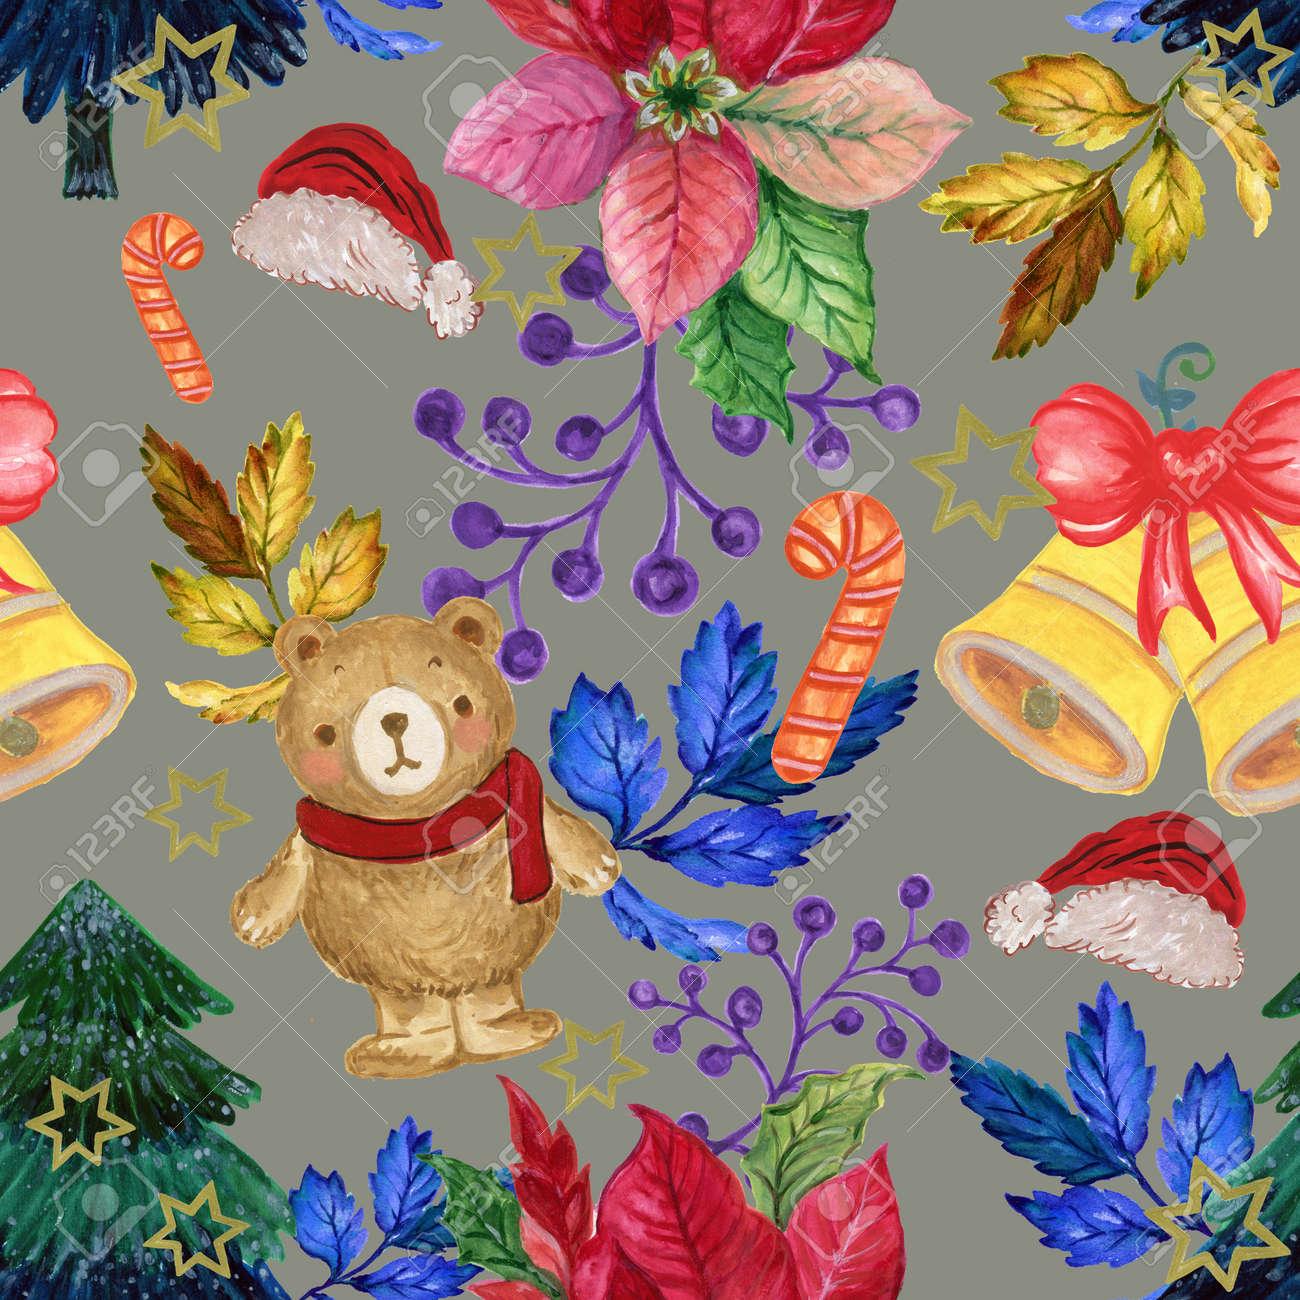 Christmas Illustrations Vintage.Stock Illustration